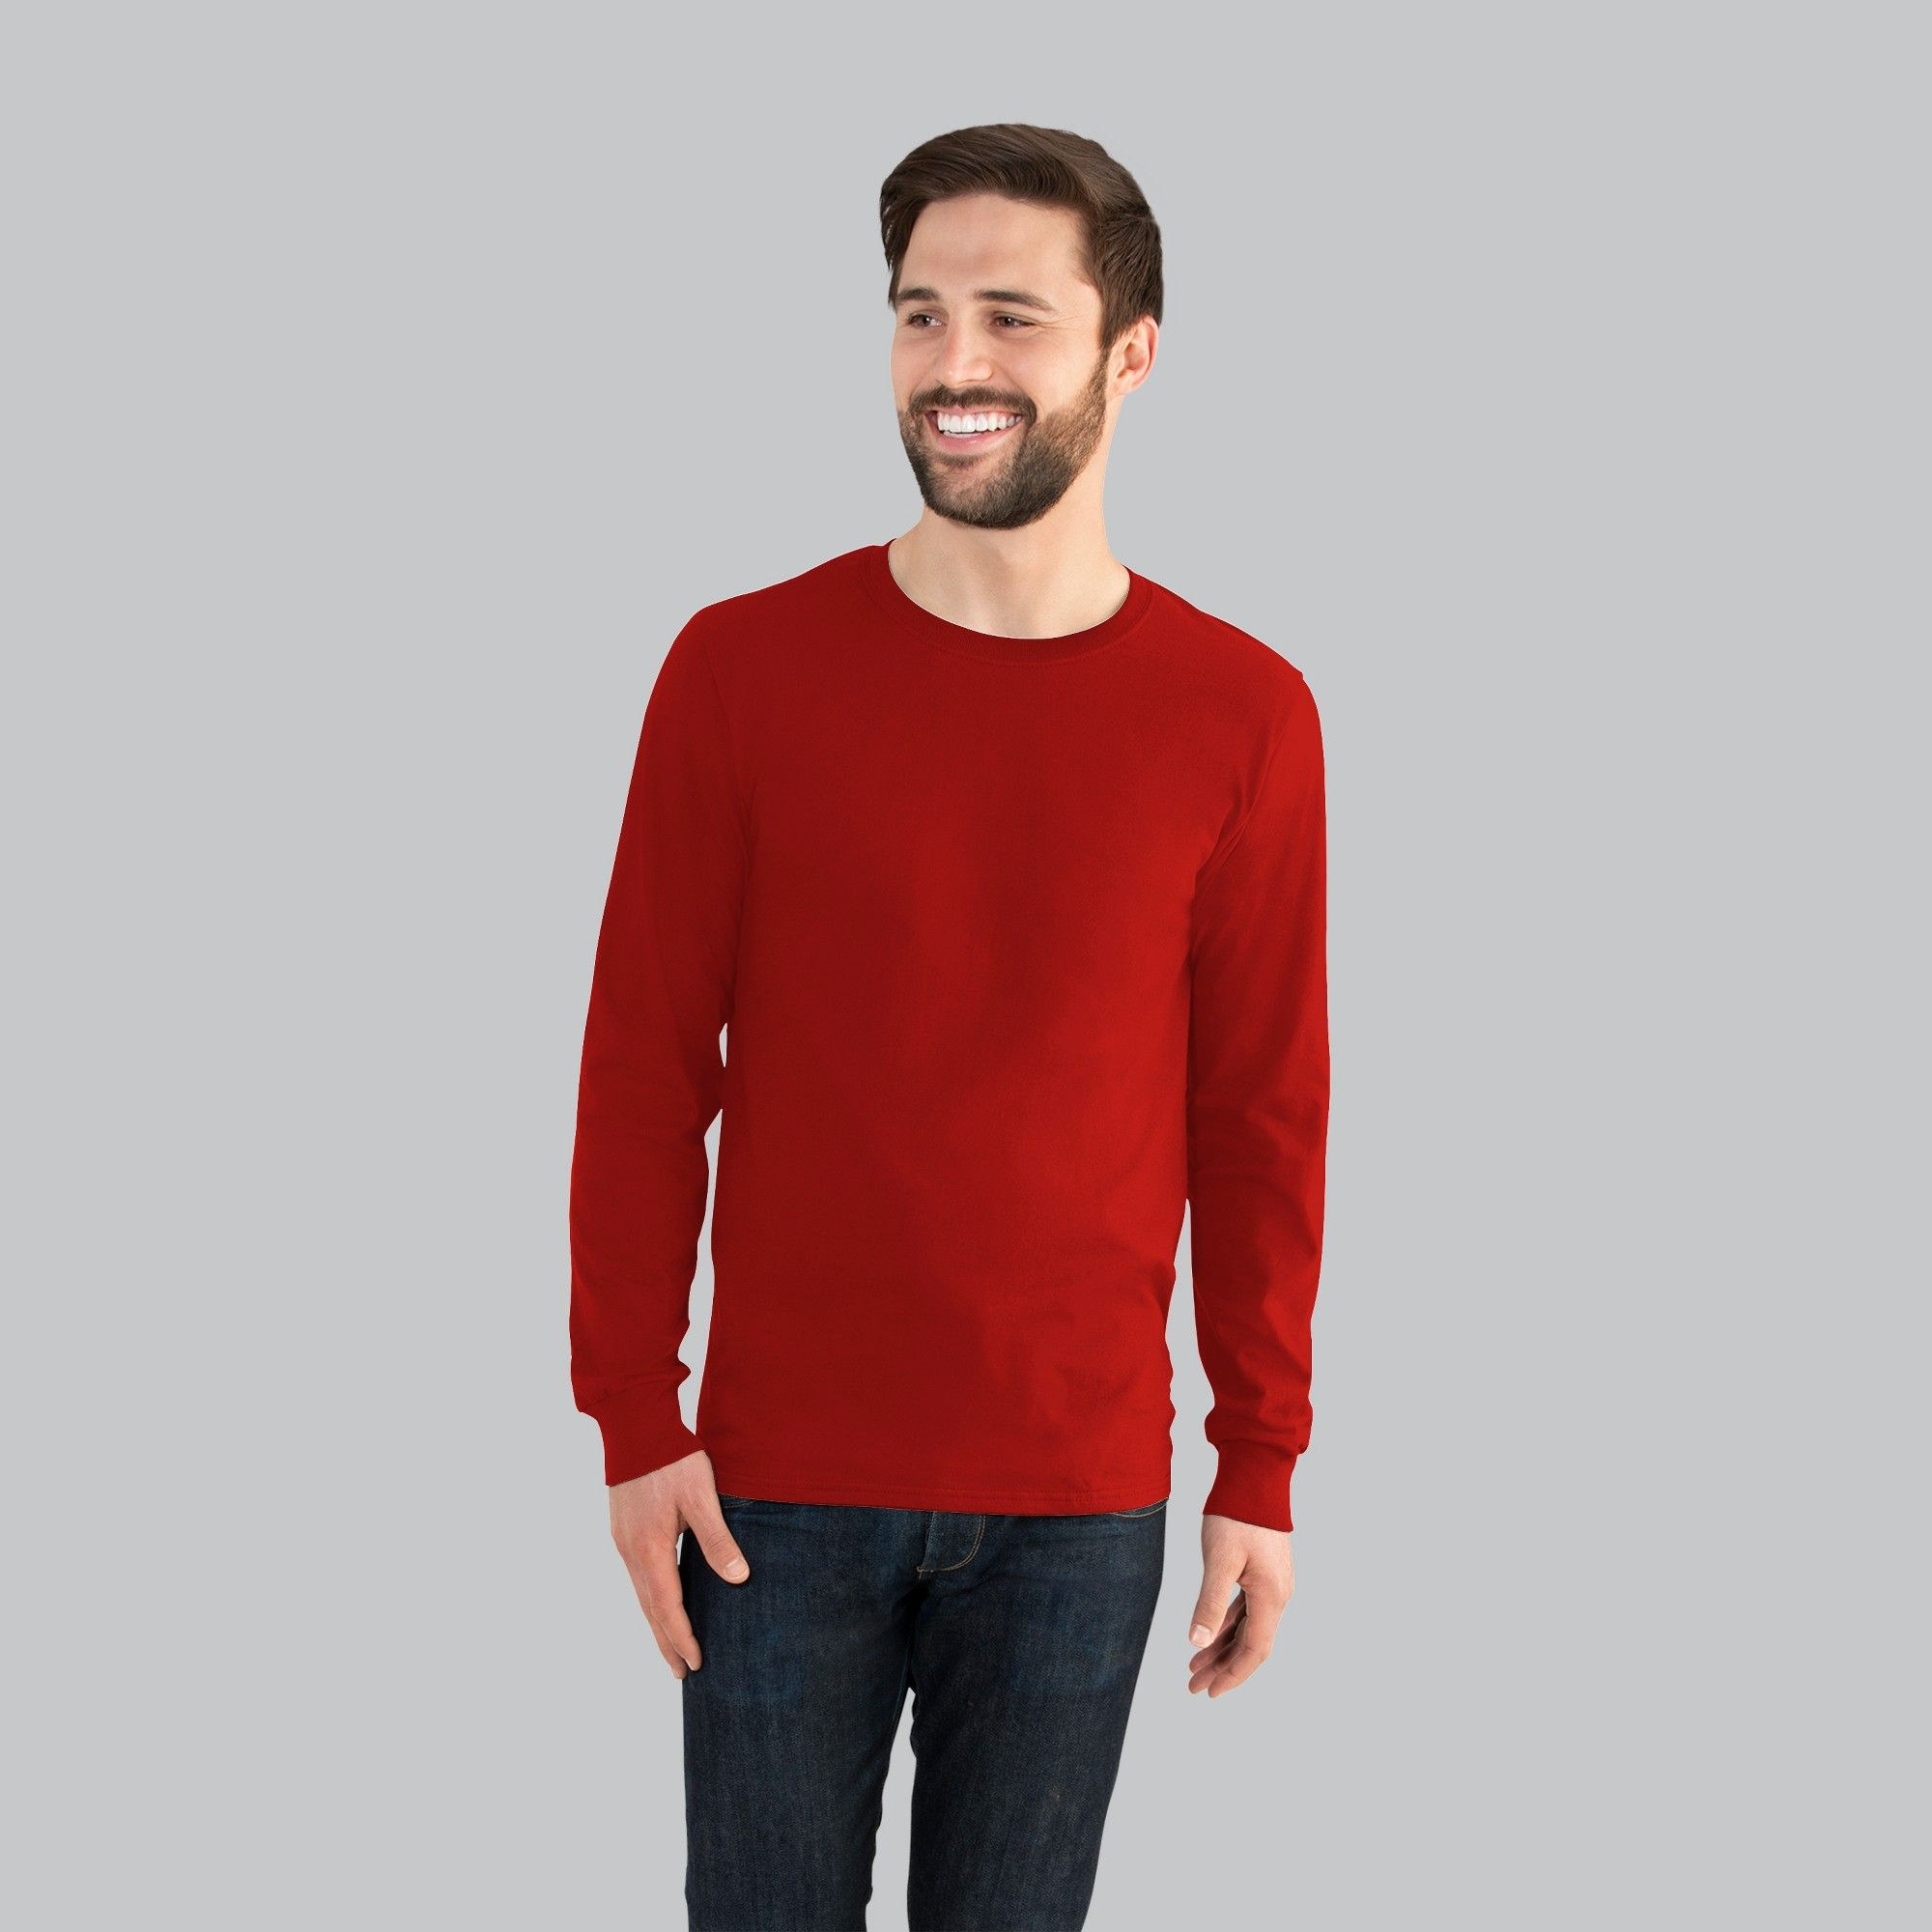 Fruit of the Loom Men's Long Sleeve TShirt Red 2XL